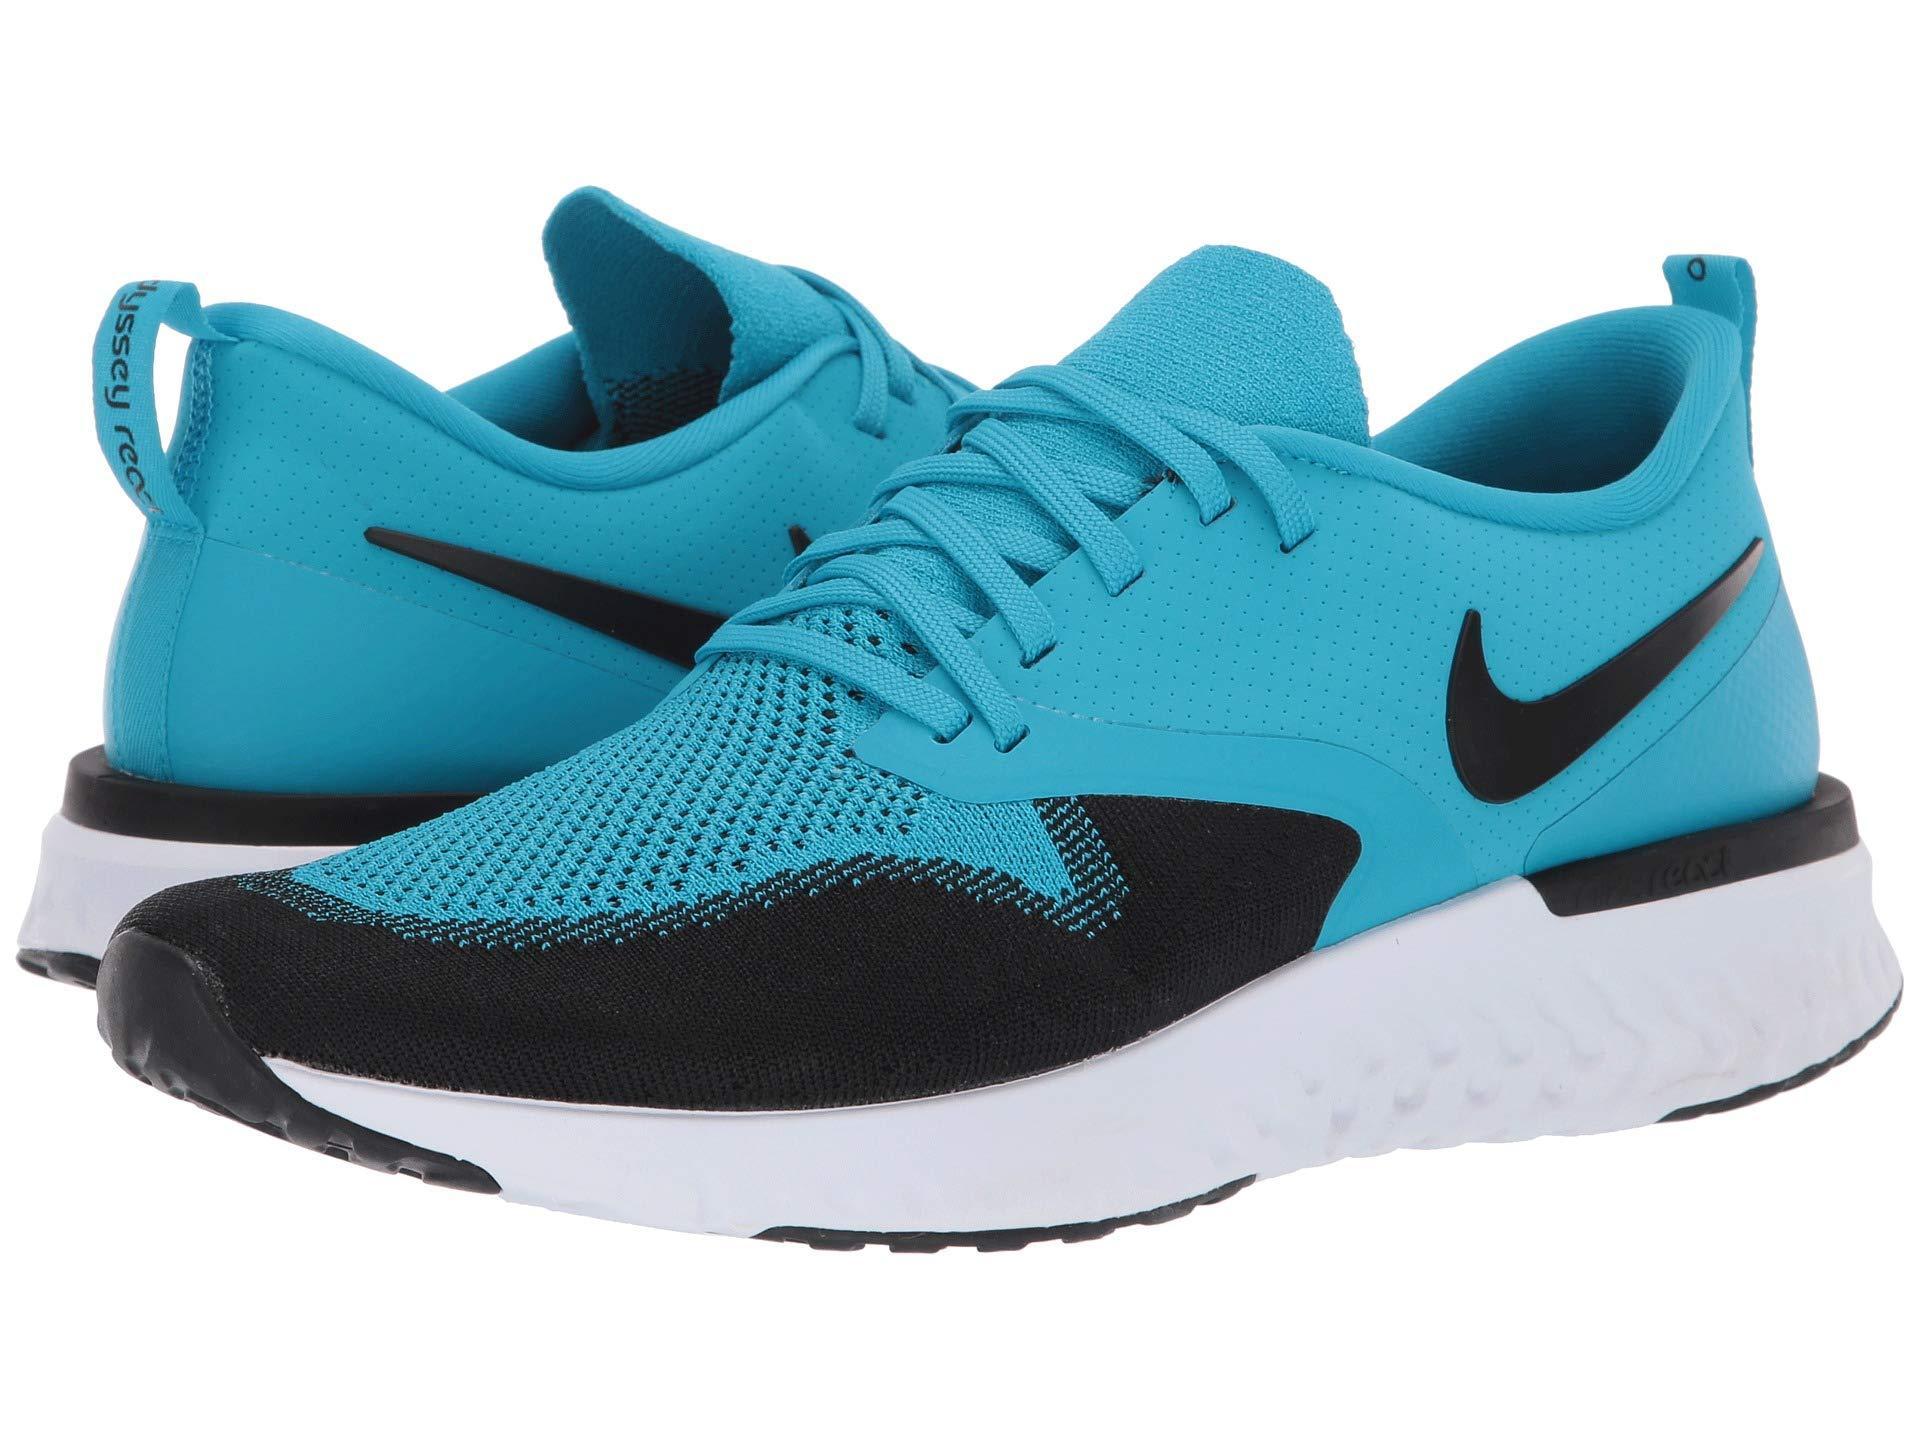 timeless design a159e b0d1f Nike. Odyssey React Flyknit 2 (indigo Force white blue Void red Orbit) Men s  Running Shoes